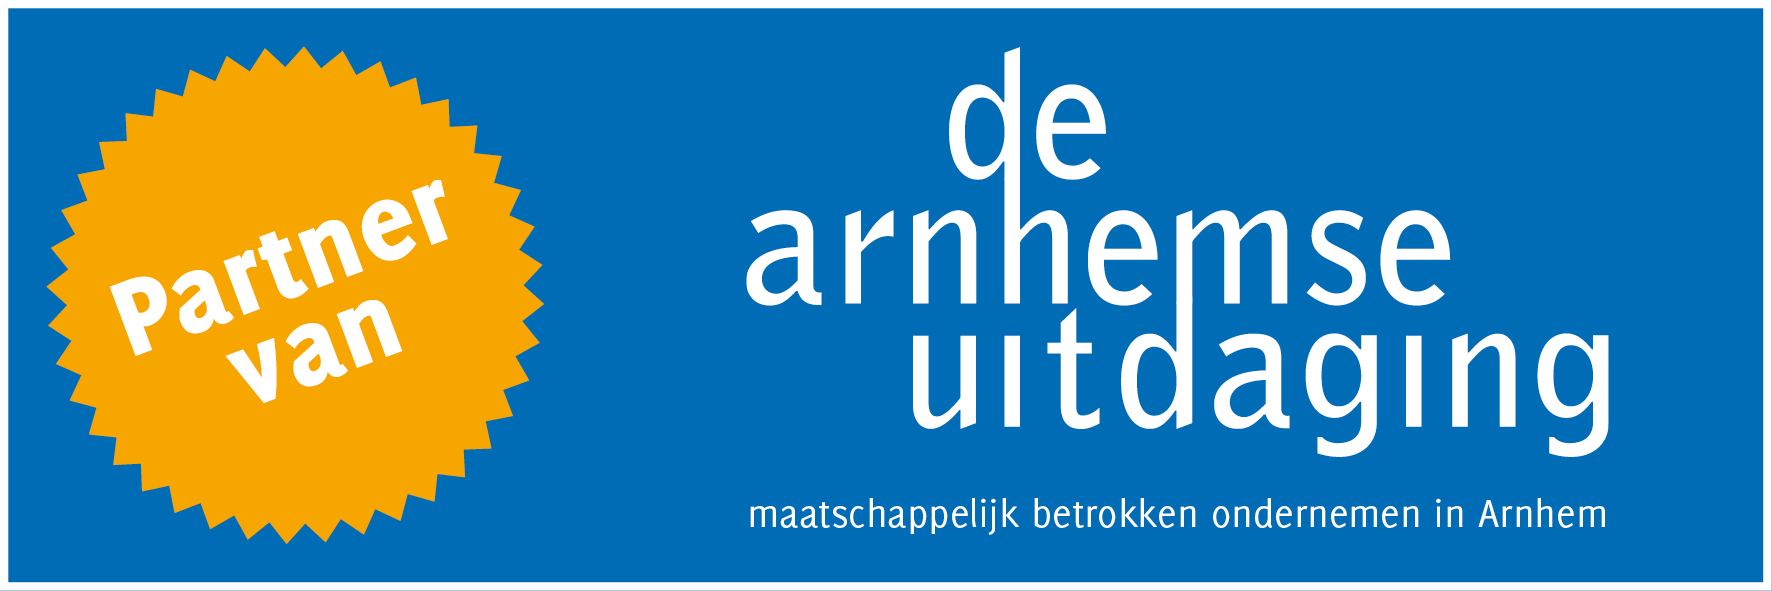 De Arnhemse uitdaging